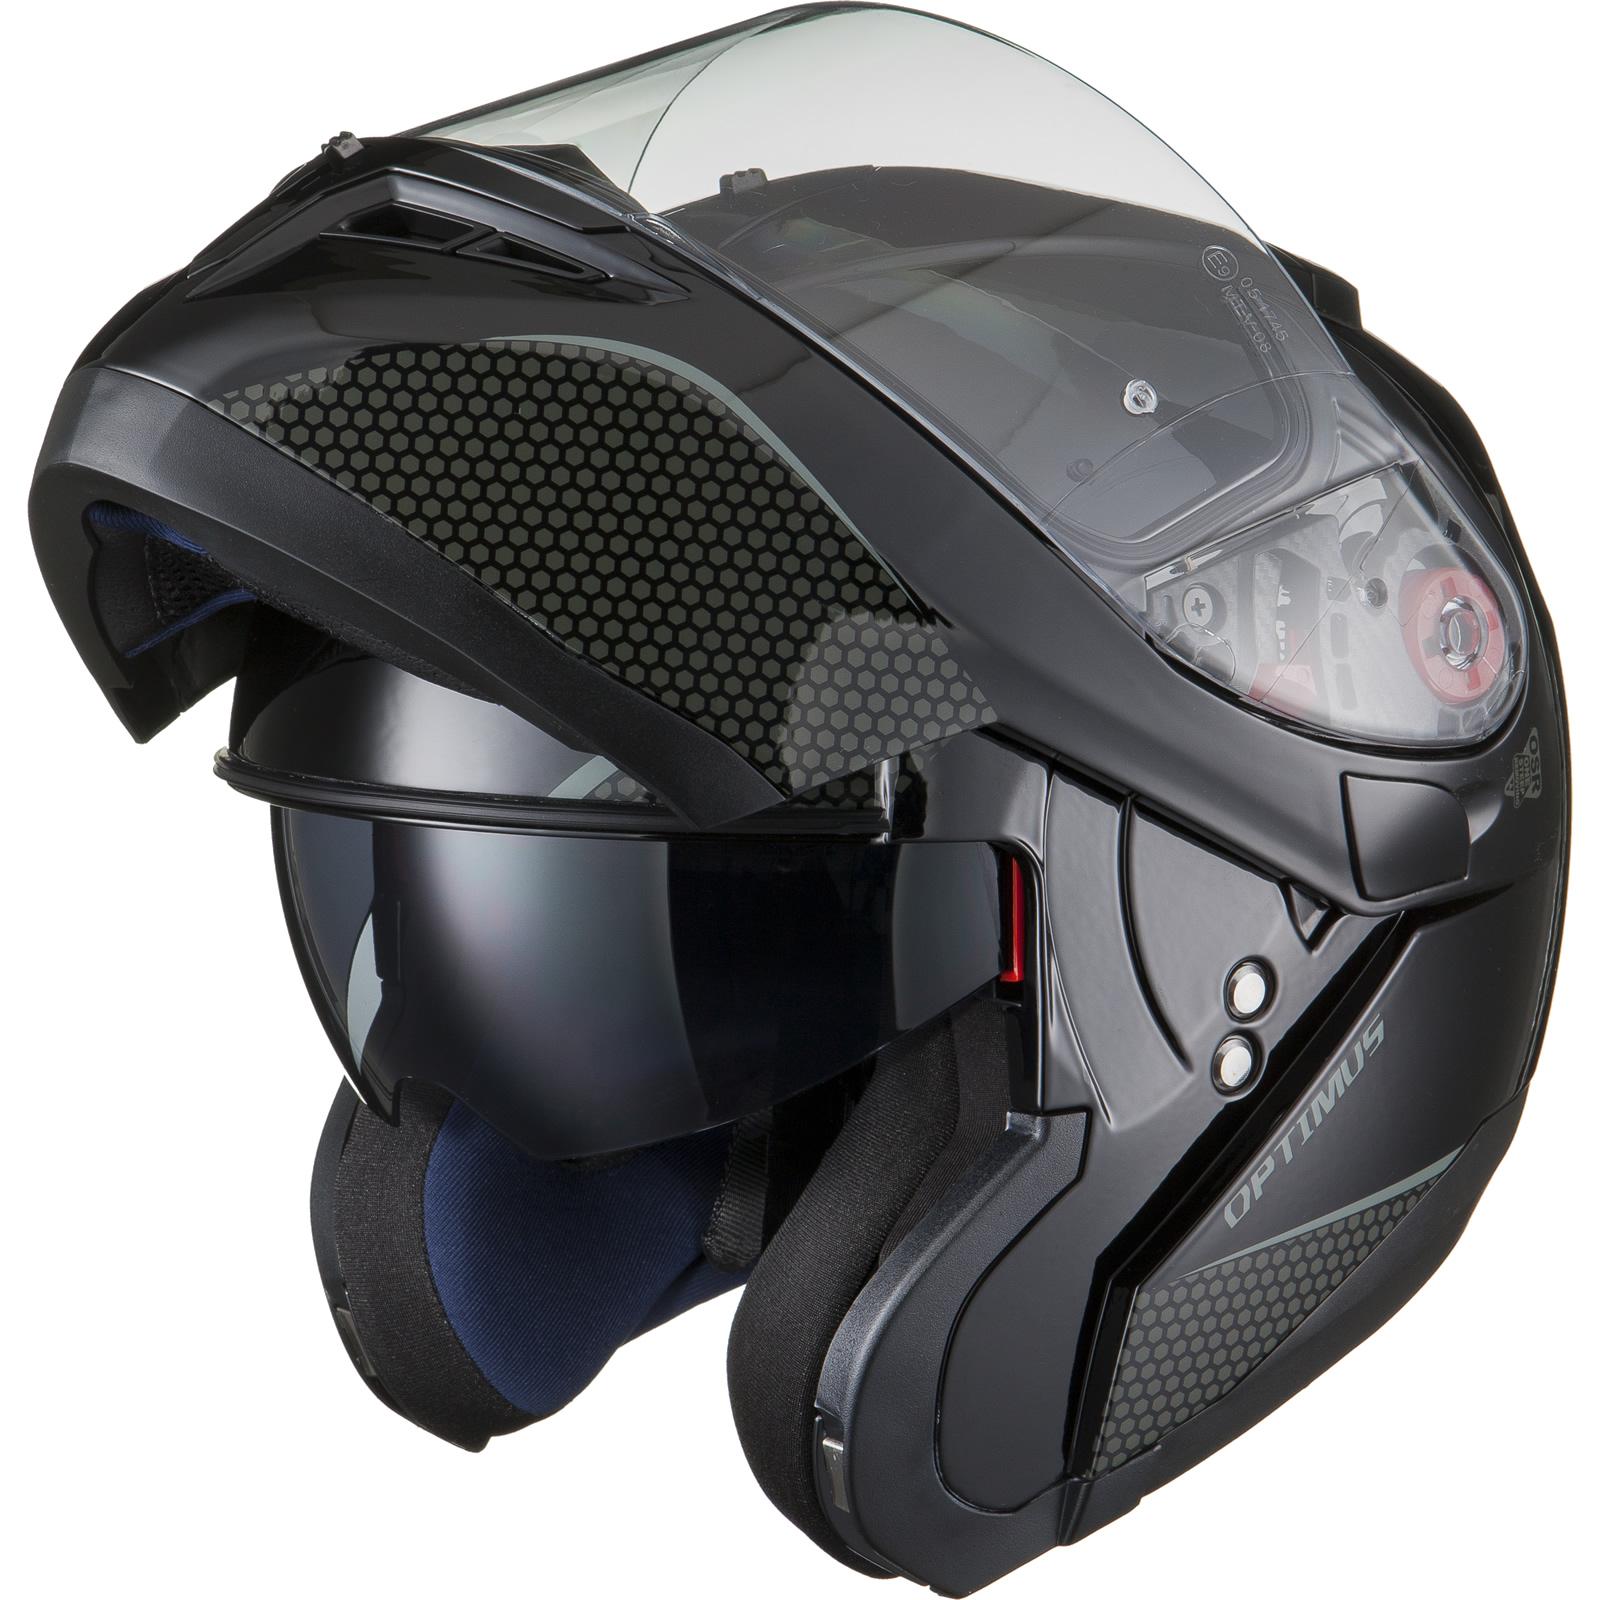 Black-Optimus-SV-Max-Vision-Flip-Up-Front-Motorcycle-Helmet-Pinlock-Ready-Visor thumbnail 18